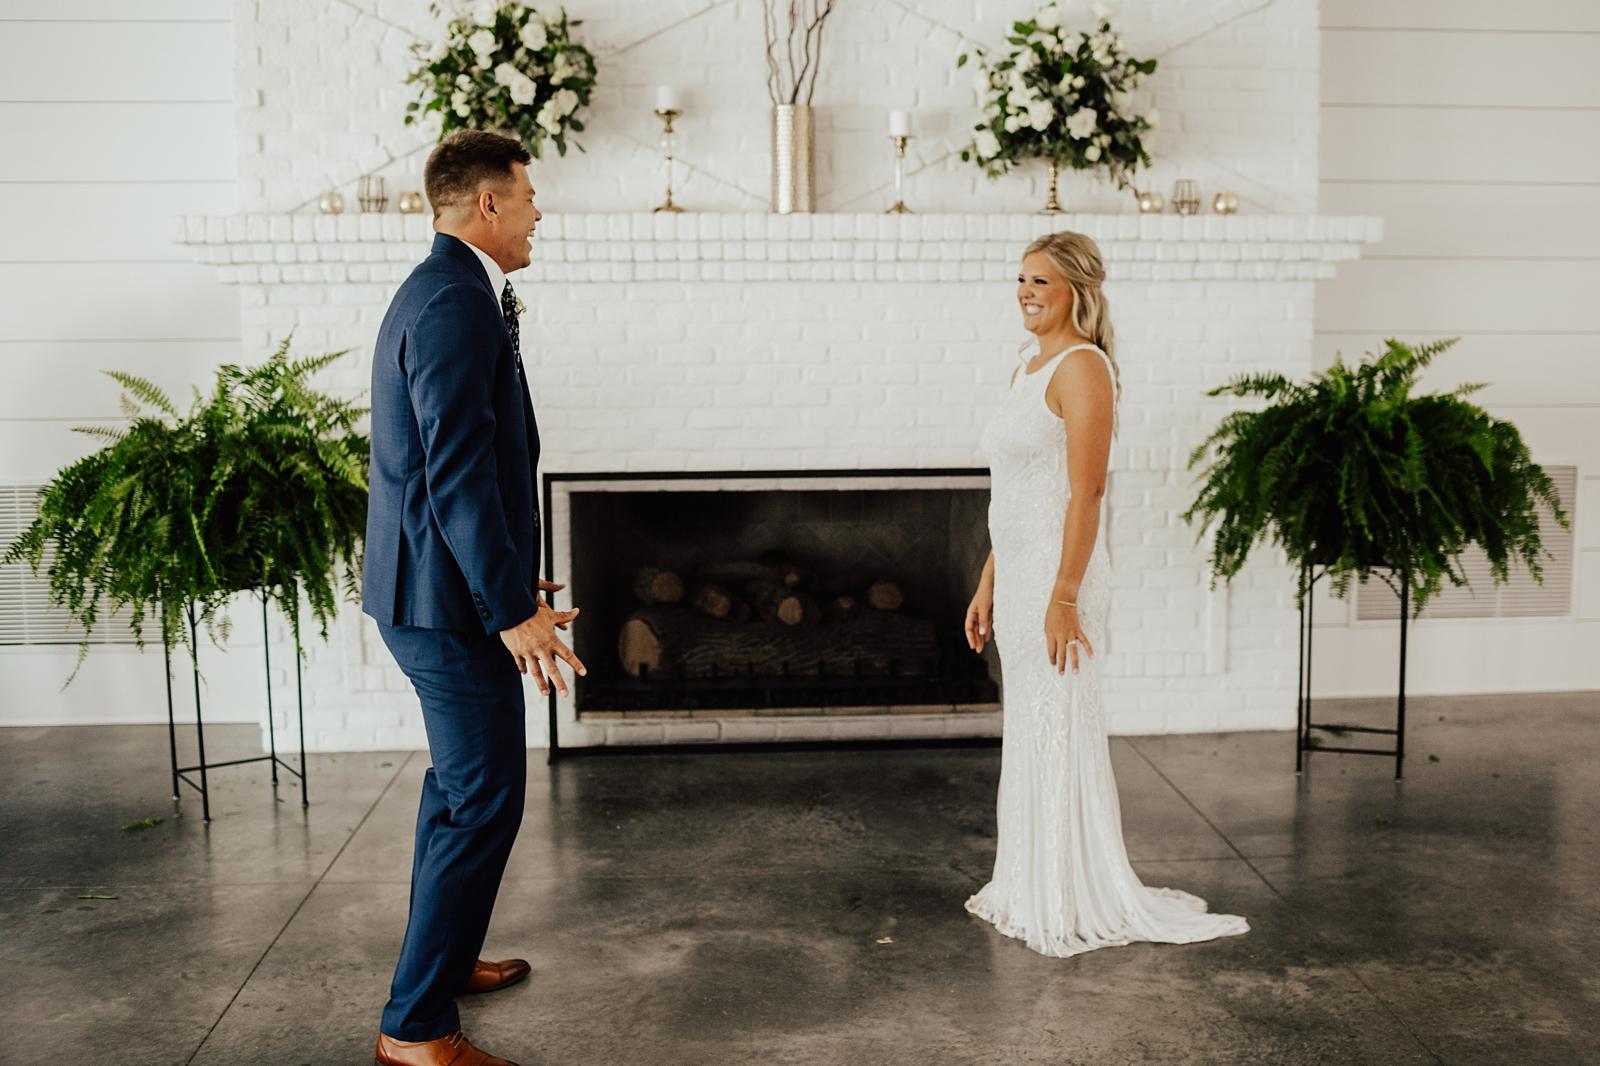 Anna & Trey Modern Minneapolis Wedding at The Hutton House_0698.jpg